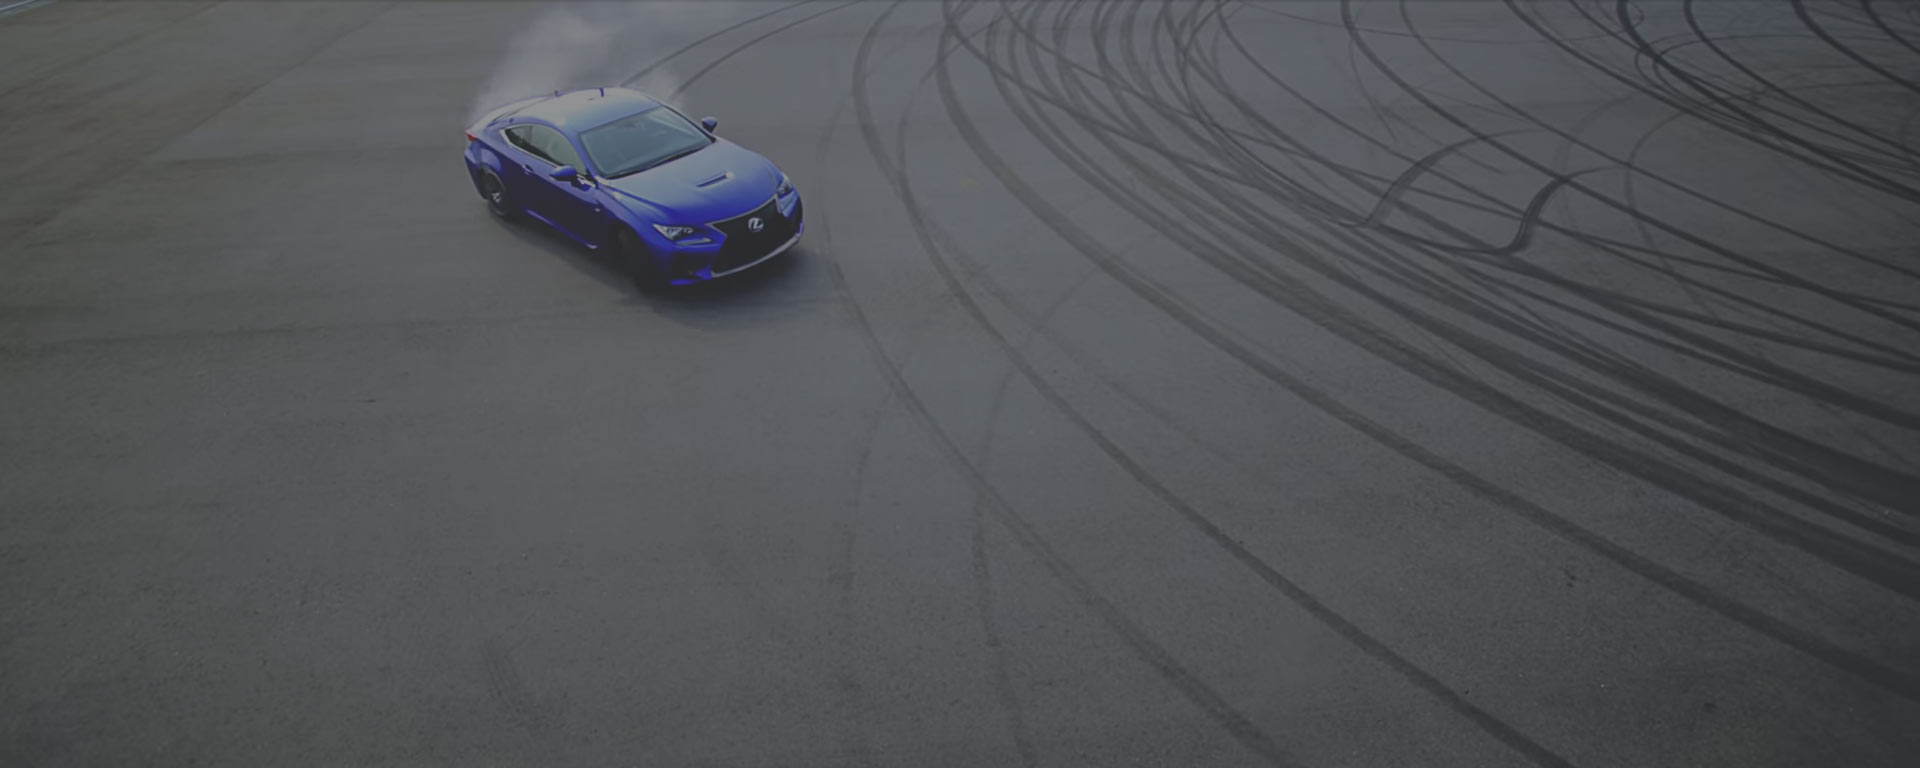 Driftende Lexus F Sport